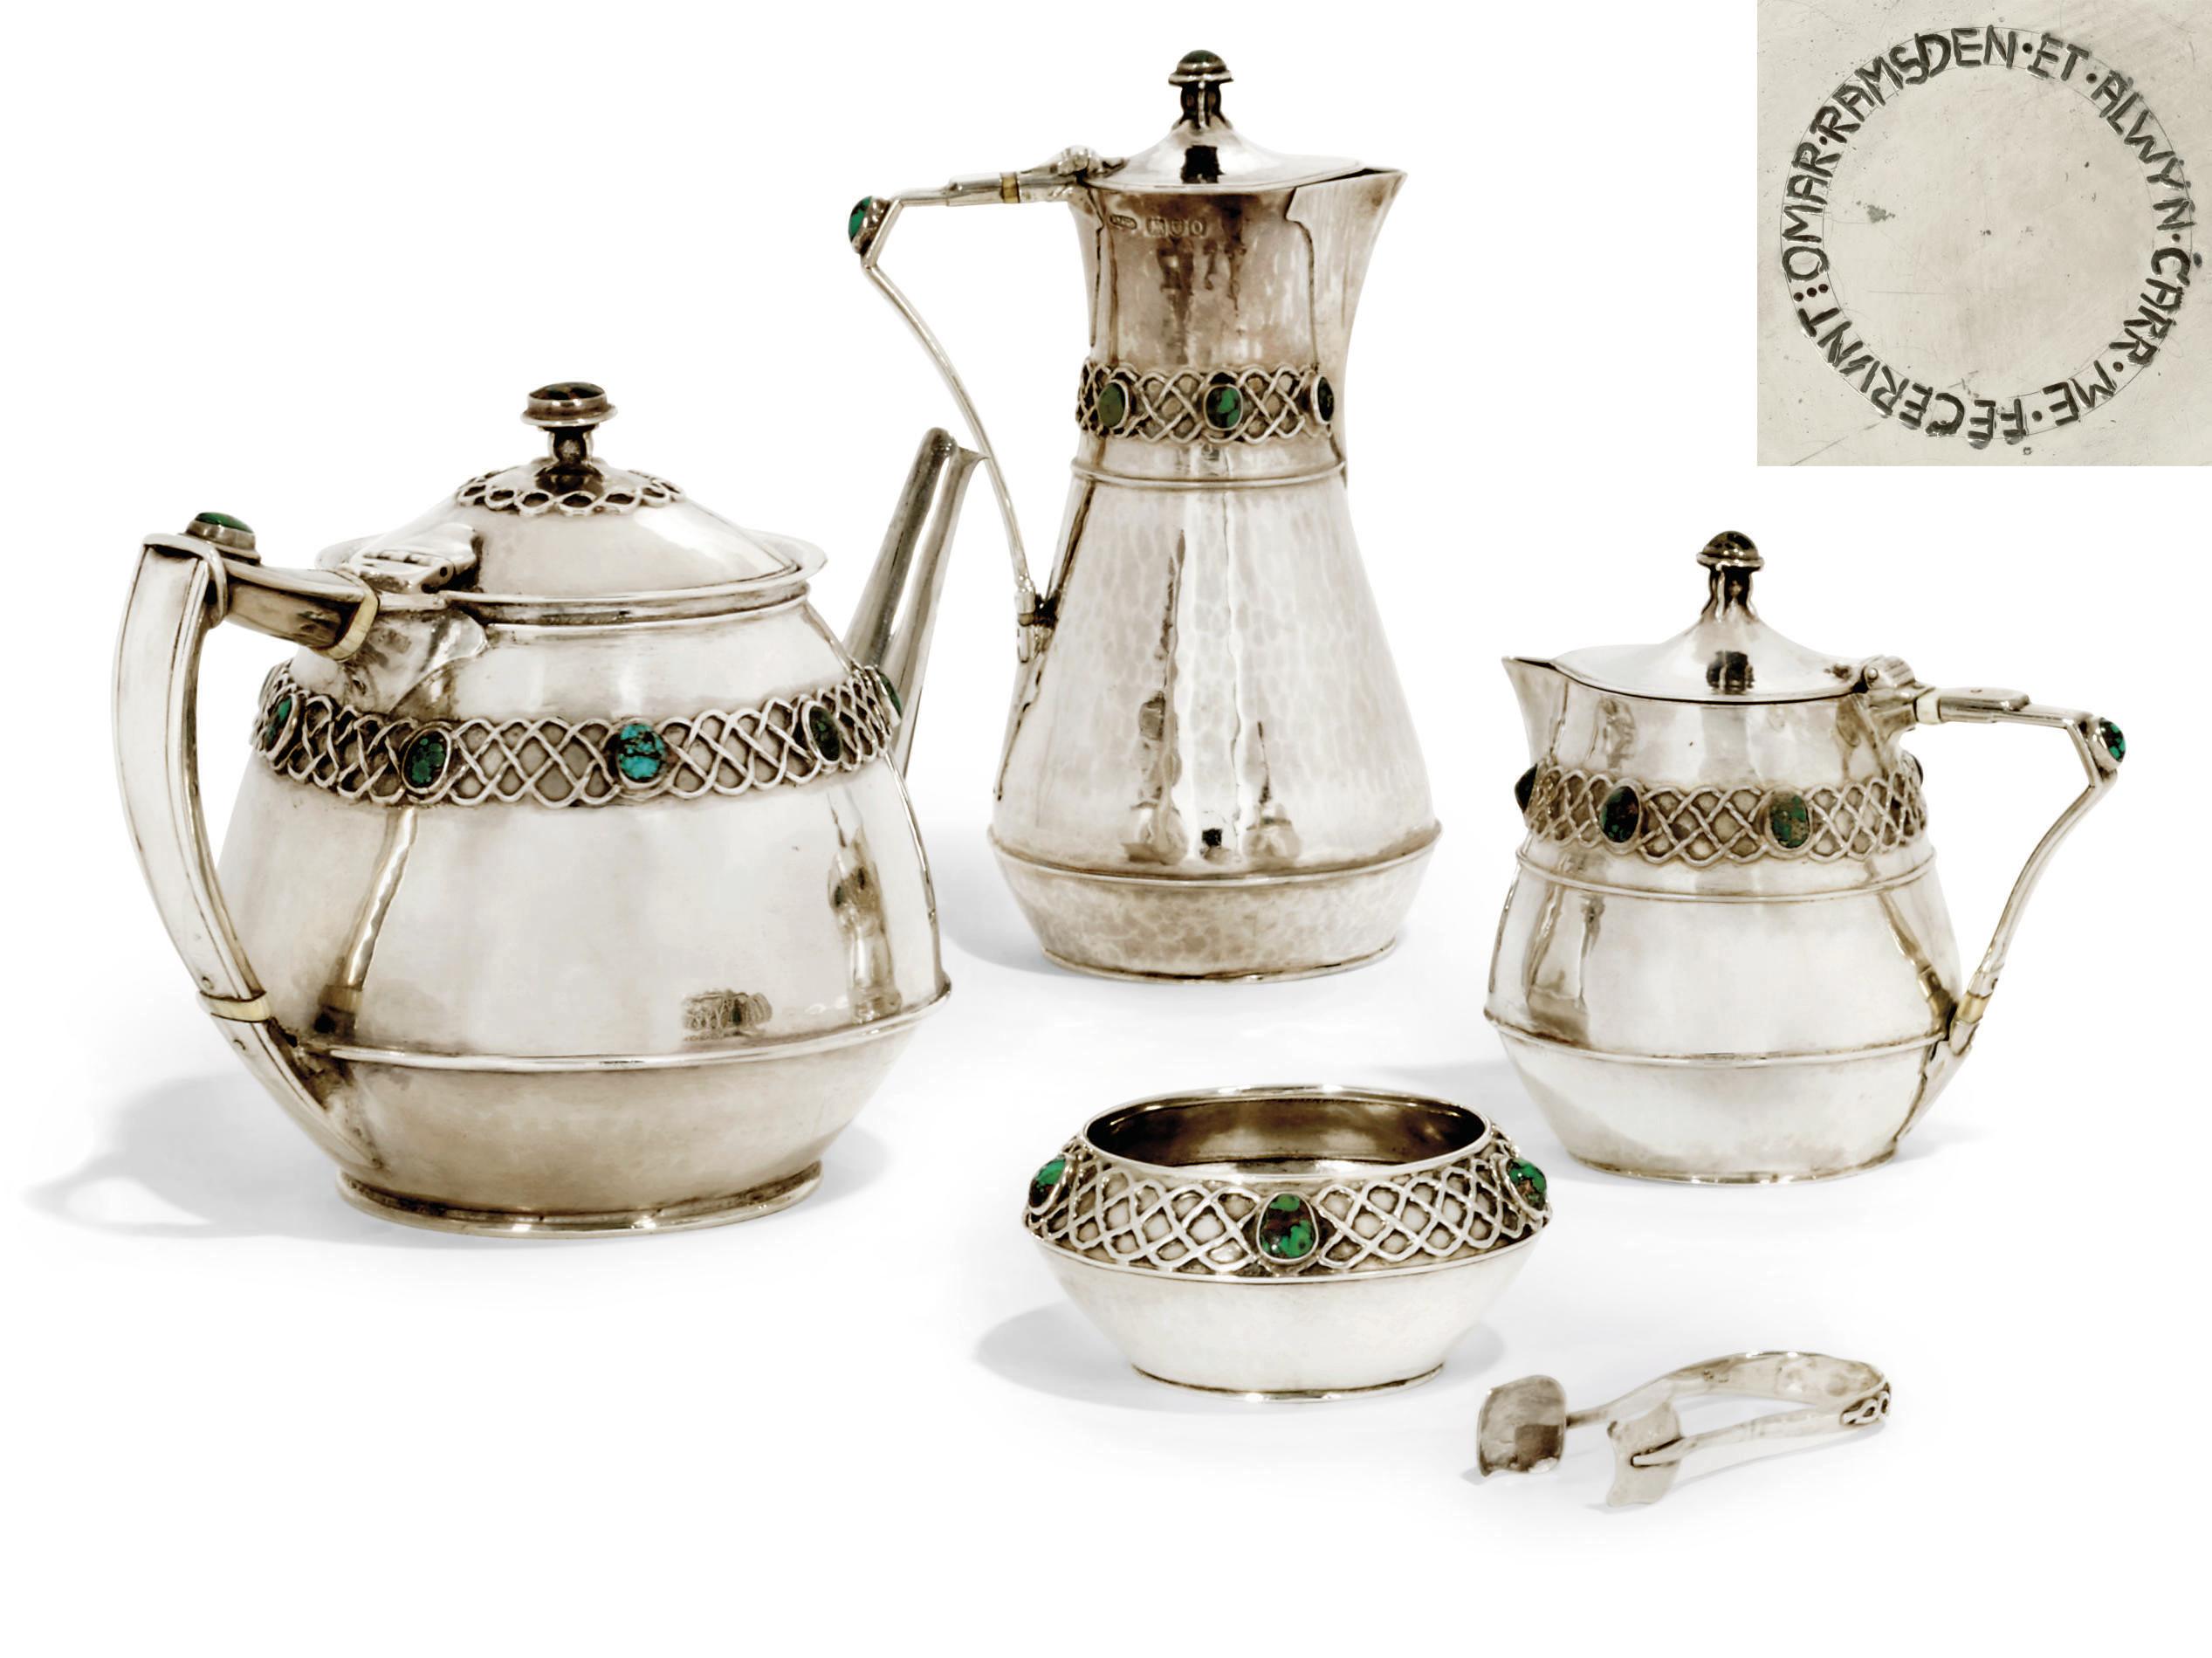 AN EDWARDIAN ARTS & CRAFTS FOUR-PIECE SILVER TEA SET